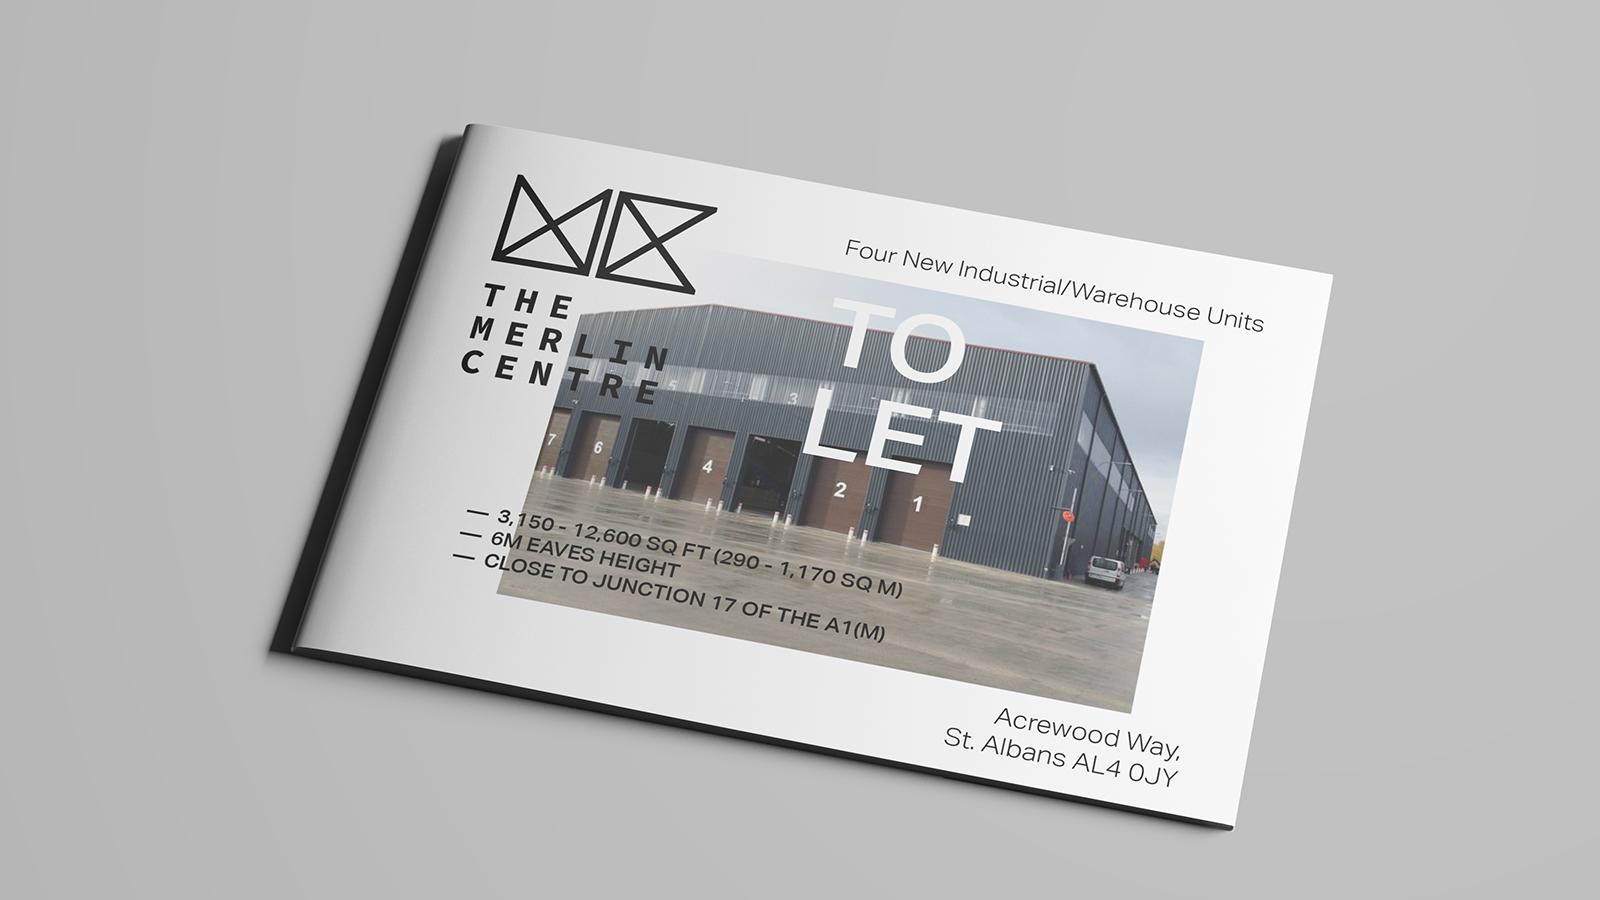 Branding-and-marketing-ALSO_Agency-Merlin-Centre-01.jpg